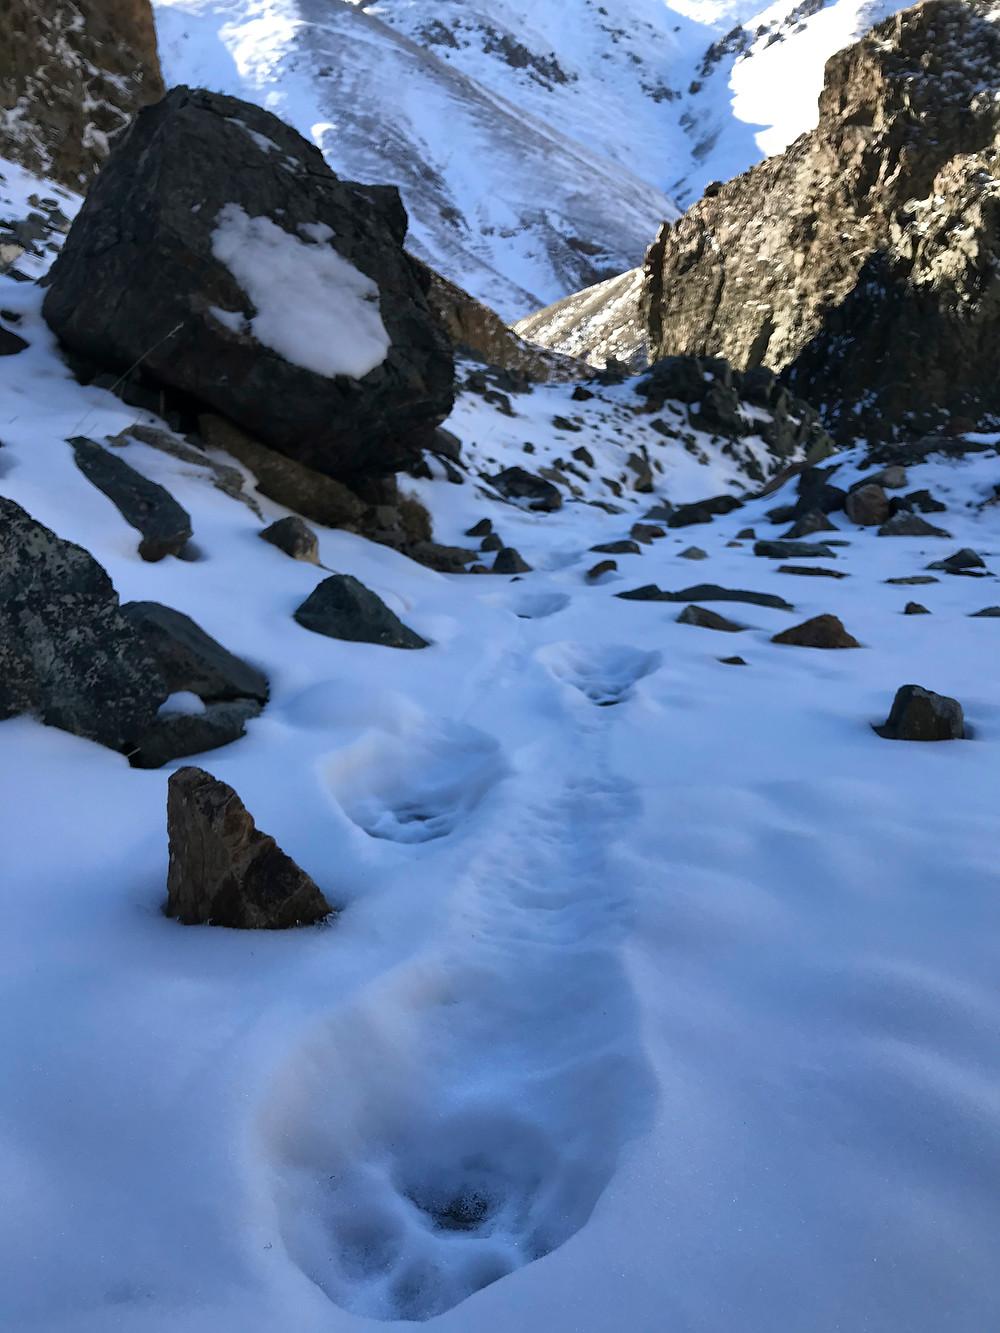 Fresh snow leopard tracks